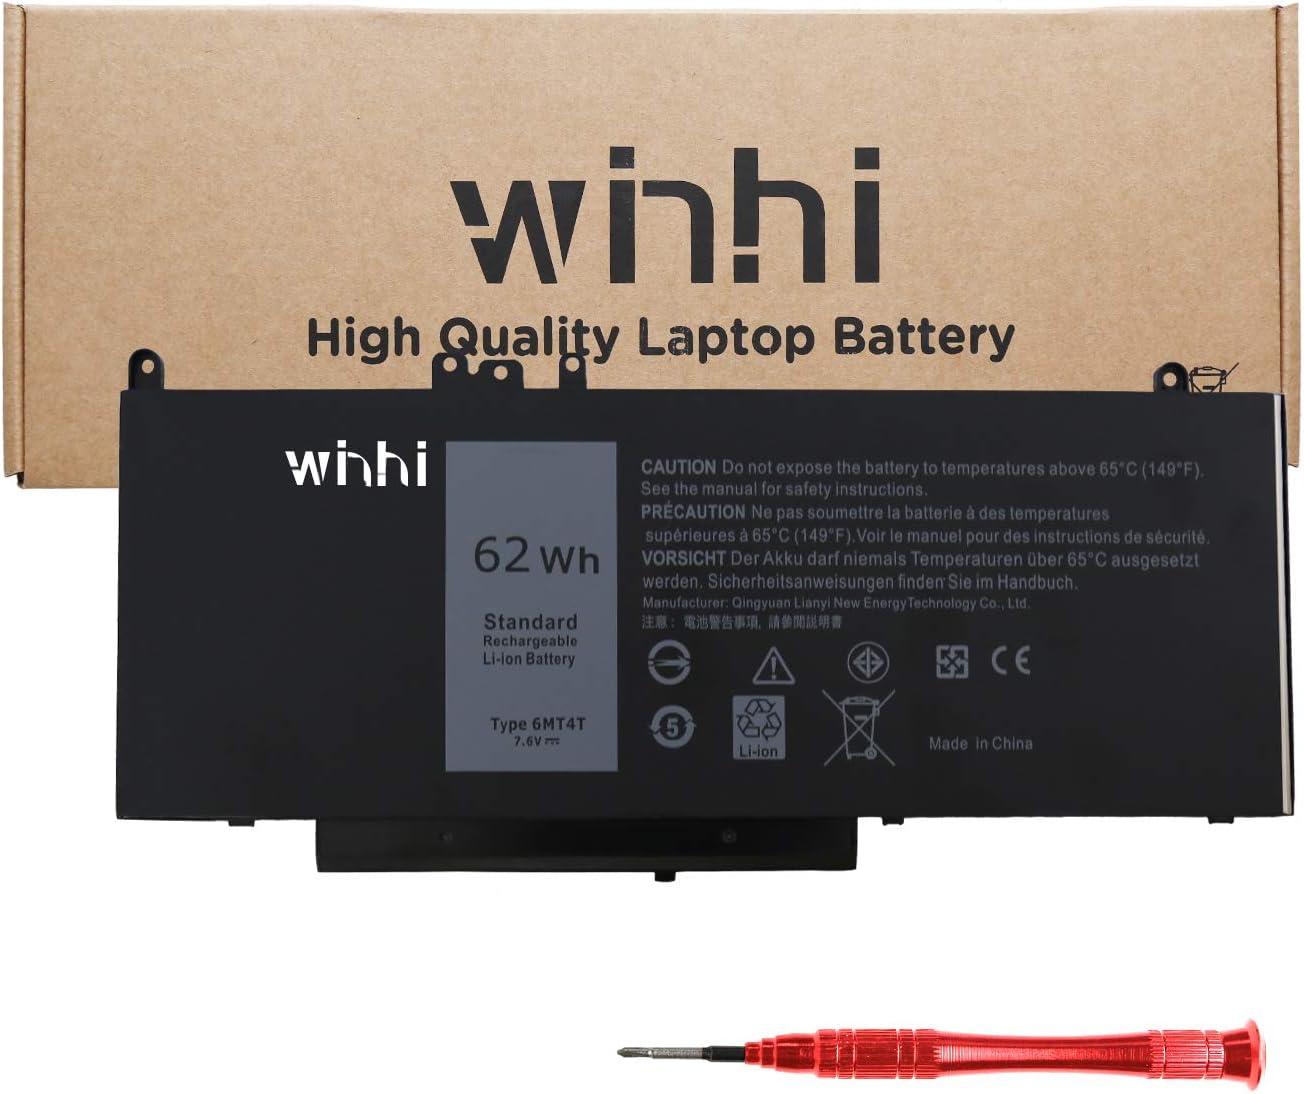 2021 New WINHI 6MT4T Laptop Battery for Dell Latitude 14 E5470 15 E5570 5570 5470 Precision 3510 7V69Y TXF9M 79VRK 7.6V 62Wh